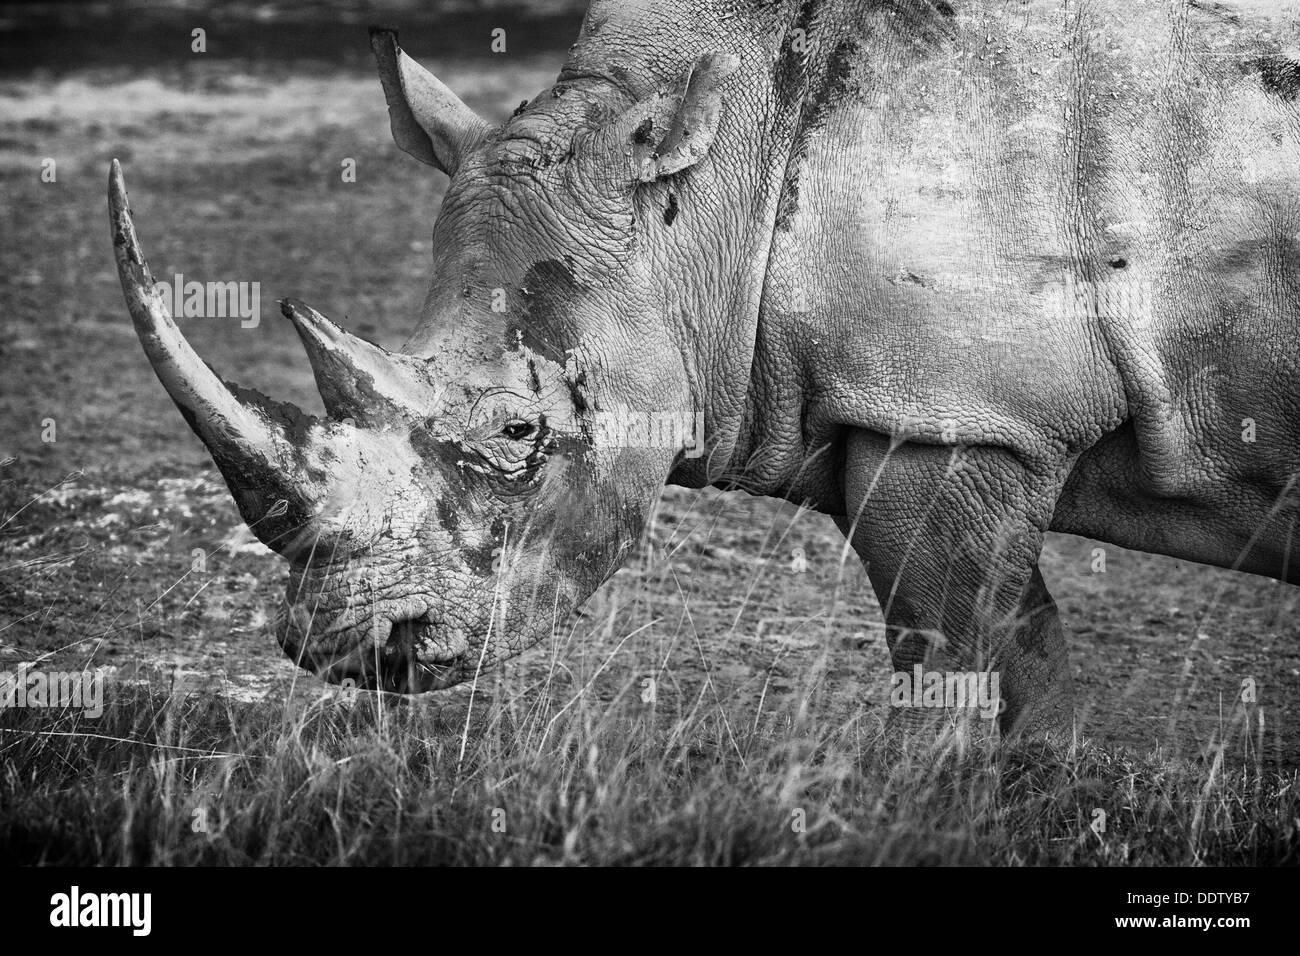 Single white rhino grazing: detail of head and front, side view in monochrome, Lake Nakuru, Kenya Stock Photo